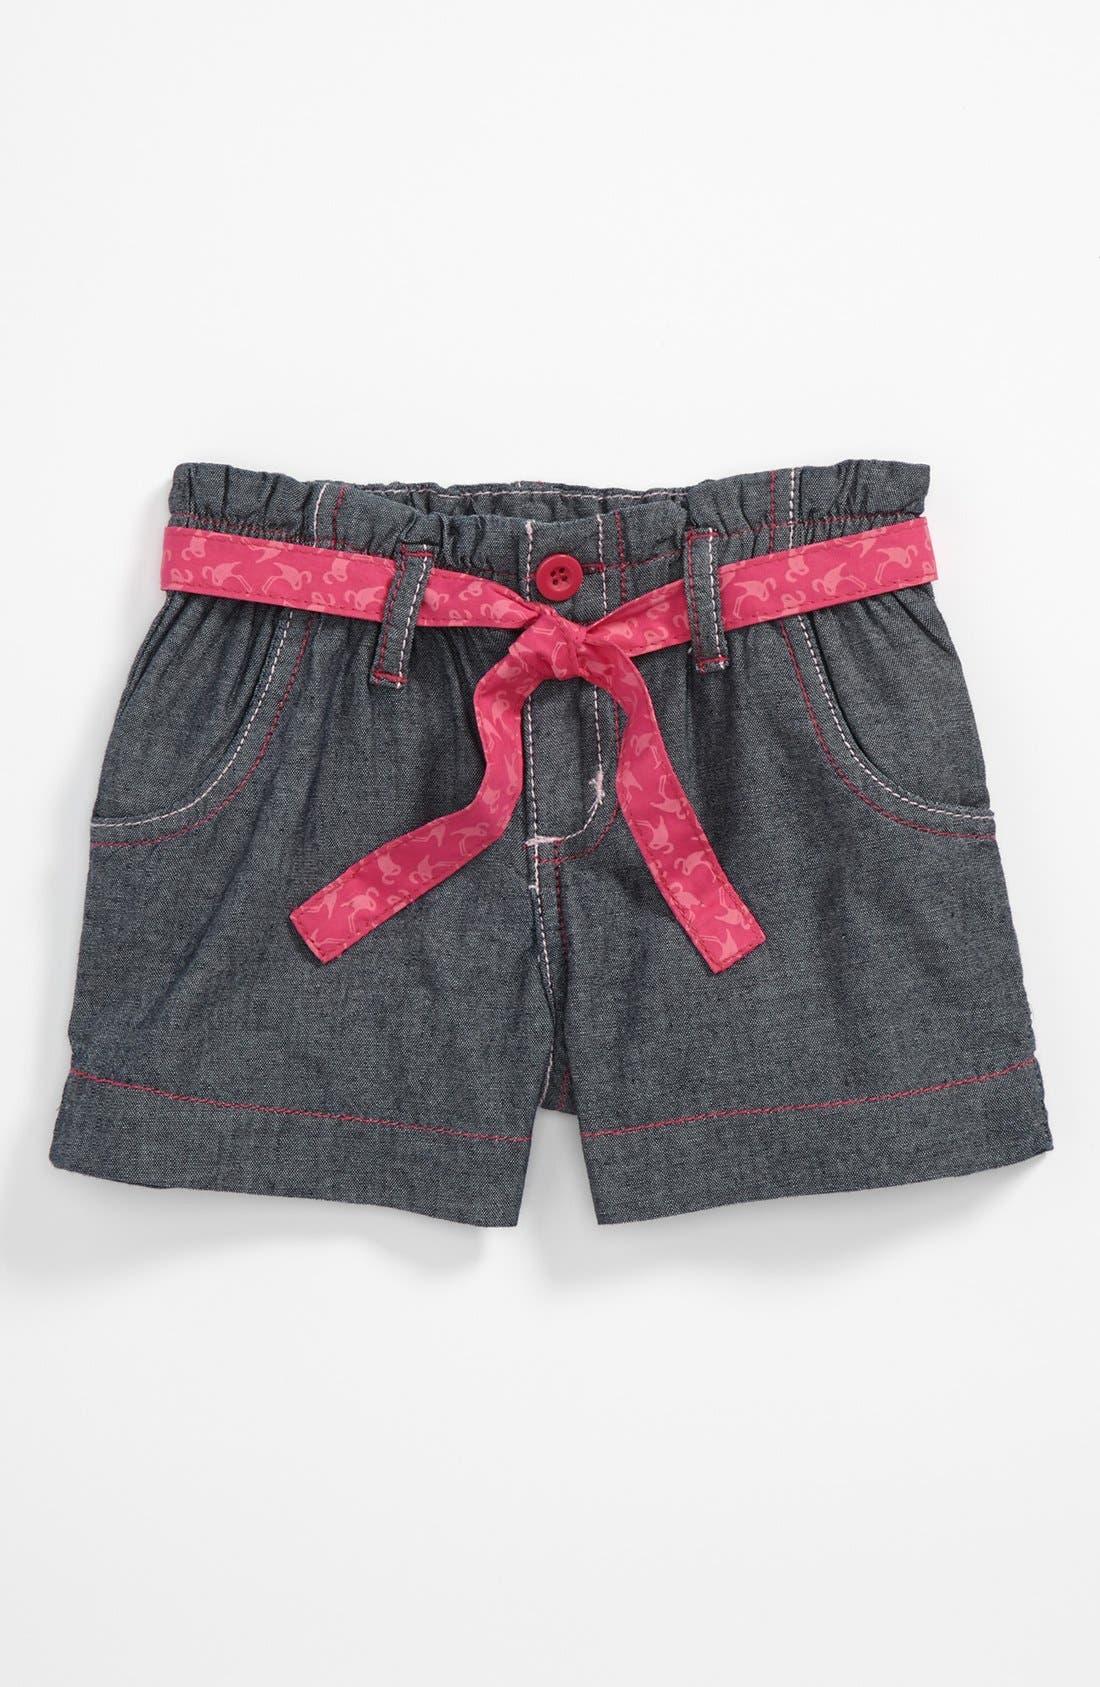 Alternate Image 1 Selected - Pumpkin Patch Denim Shorts (Toddler)